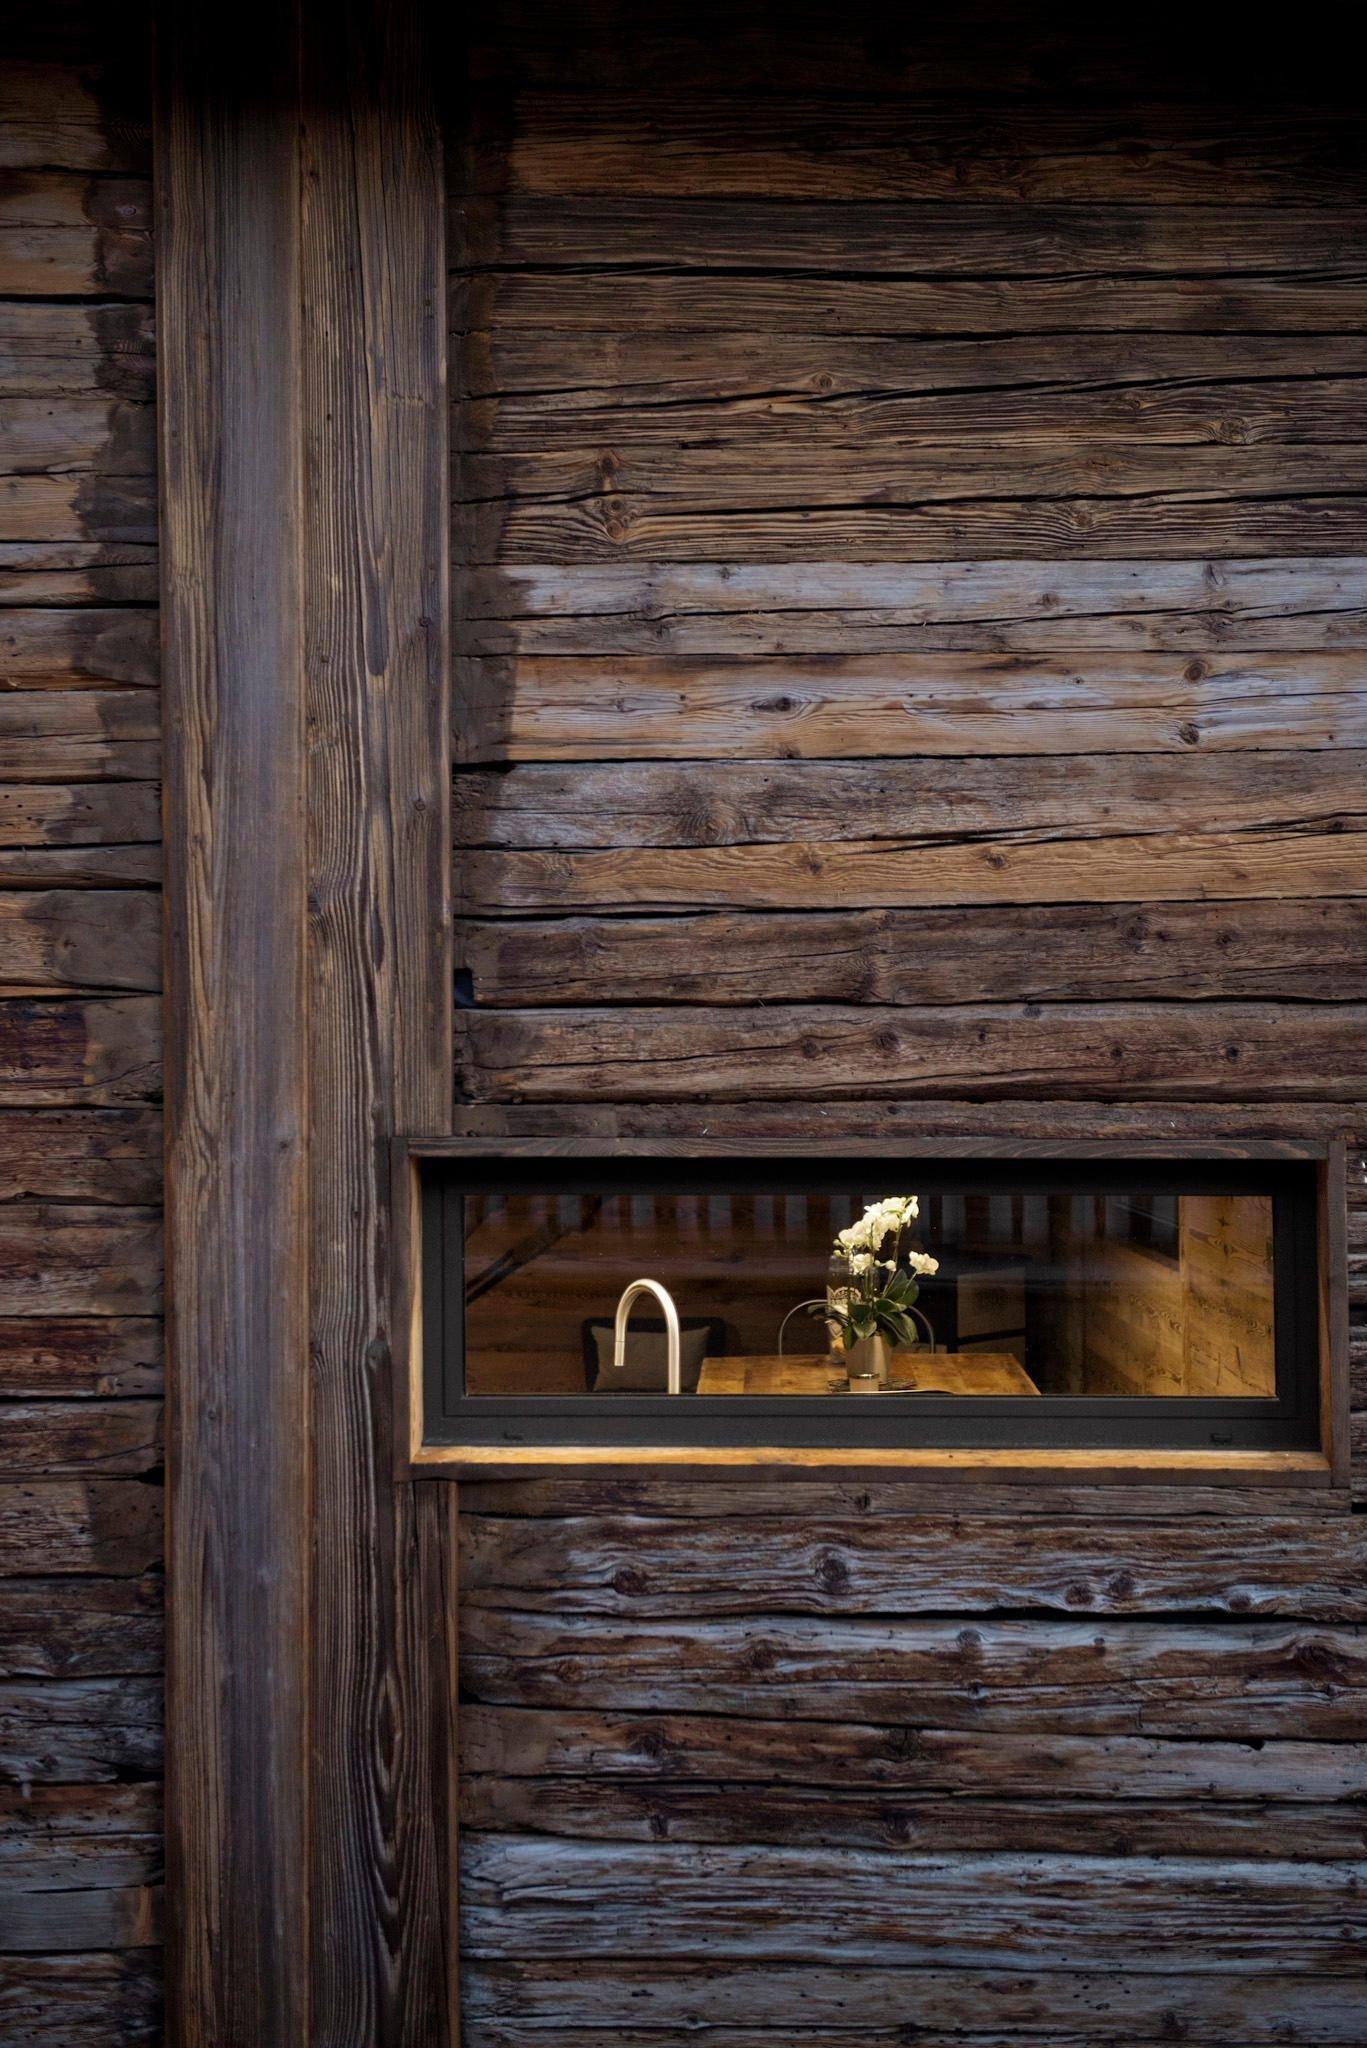 Rekonstrukce 200 let staré stodoly